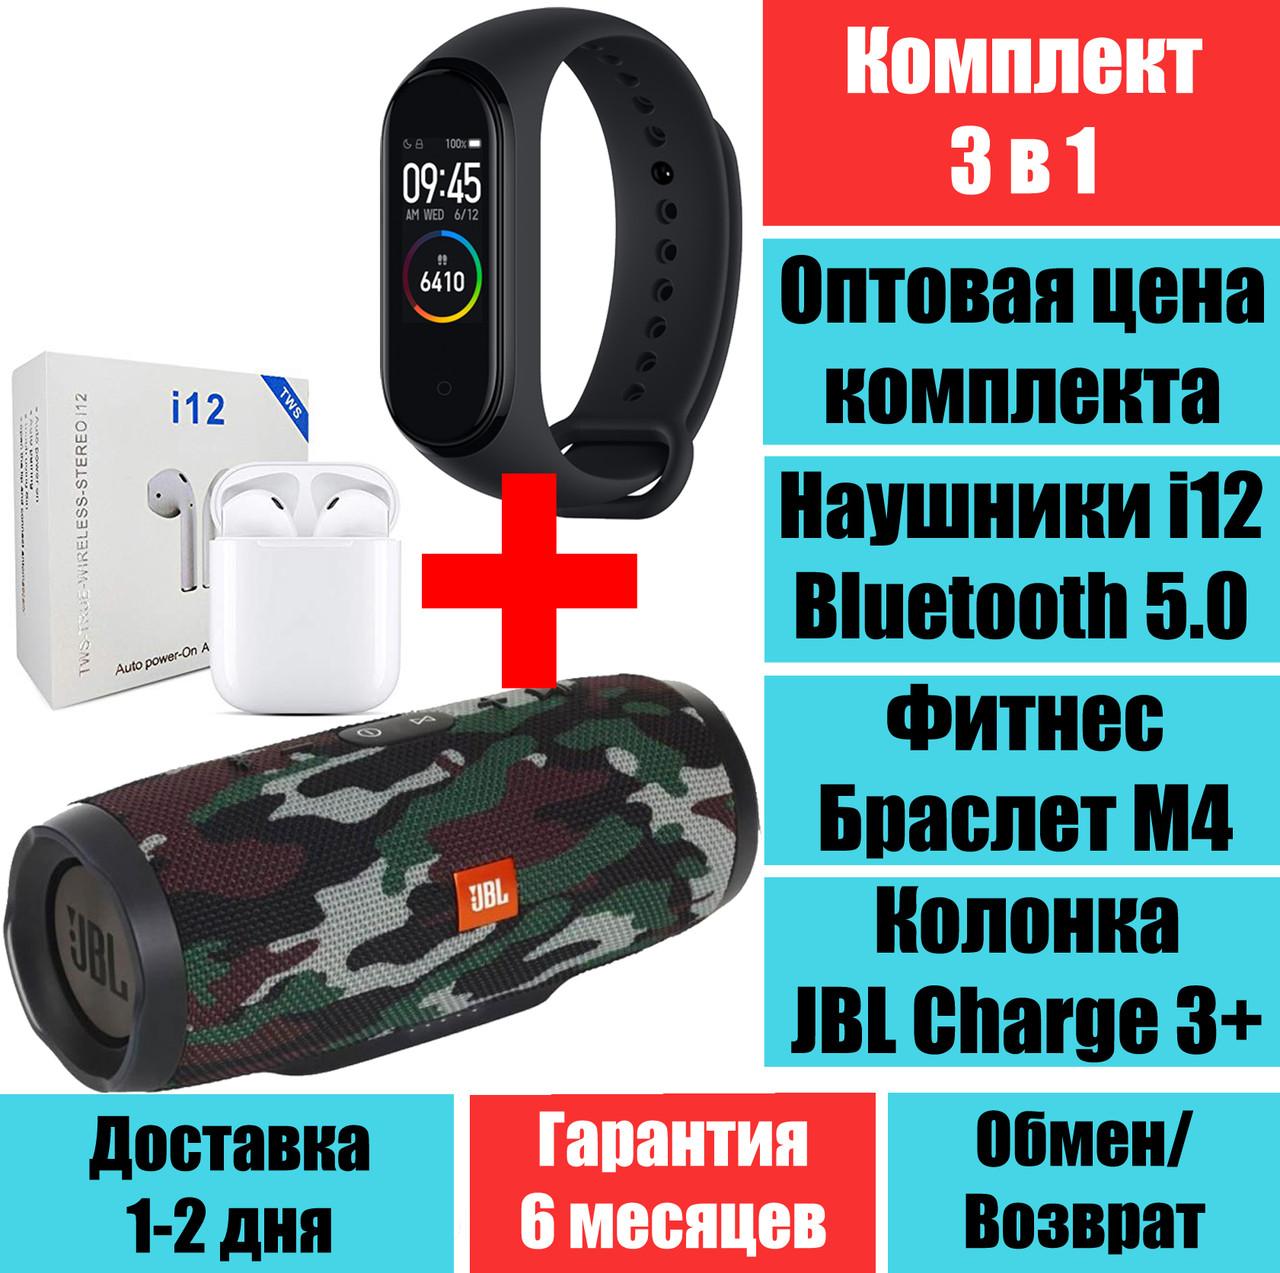 Колонка JBL Charge 3+ Камуфляж, Фитнес браслет M4, наушники блютус i12 Mini Bluetooth Комплект QualitiReplica